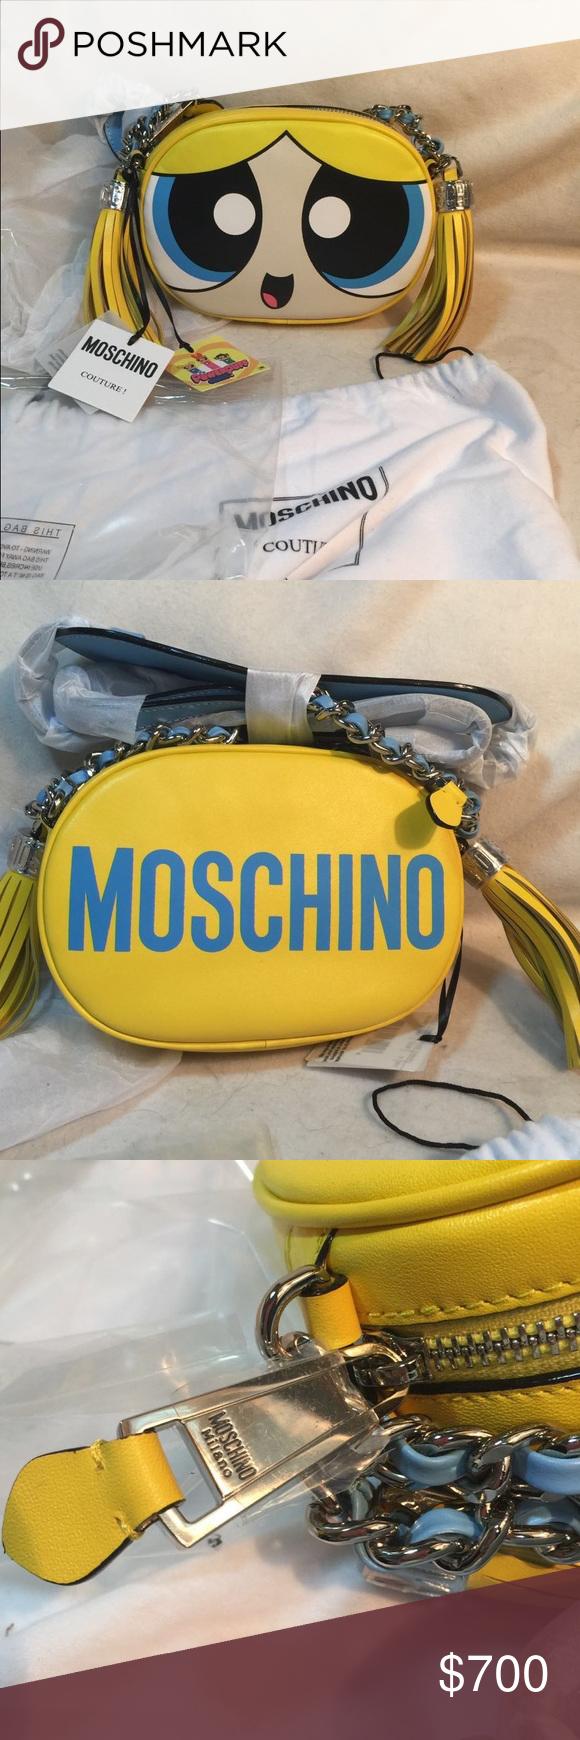 df1bcec87e Moschino Powerpuff Girls Bubbles crossbody SALE!! Multicoloured leather  'Powerpuff Girls' Bubbles crossbody bag from Moschino featuring a rounded  shape, ...